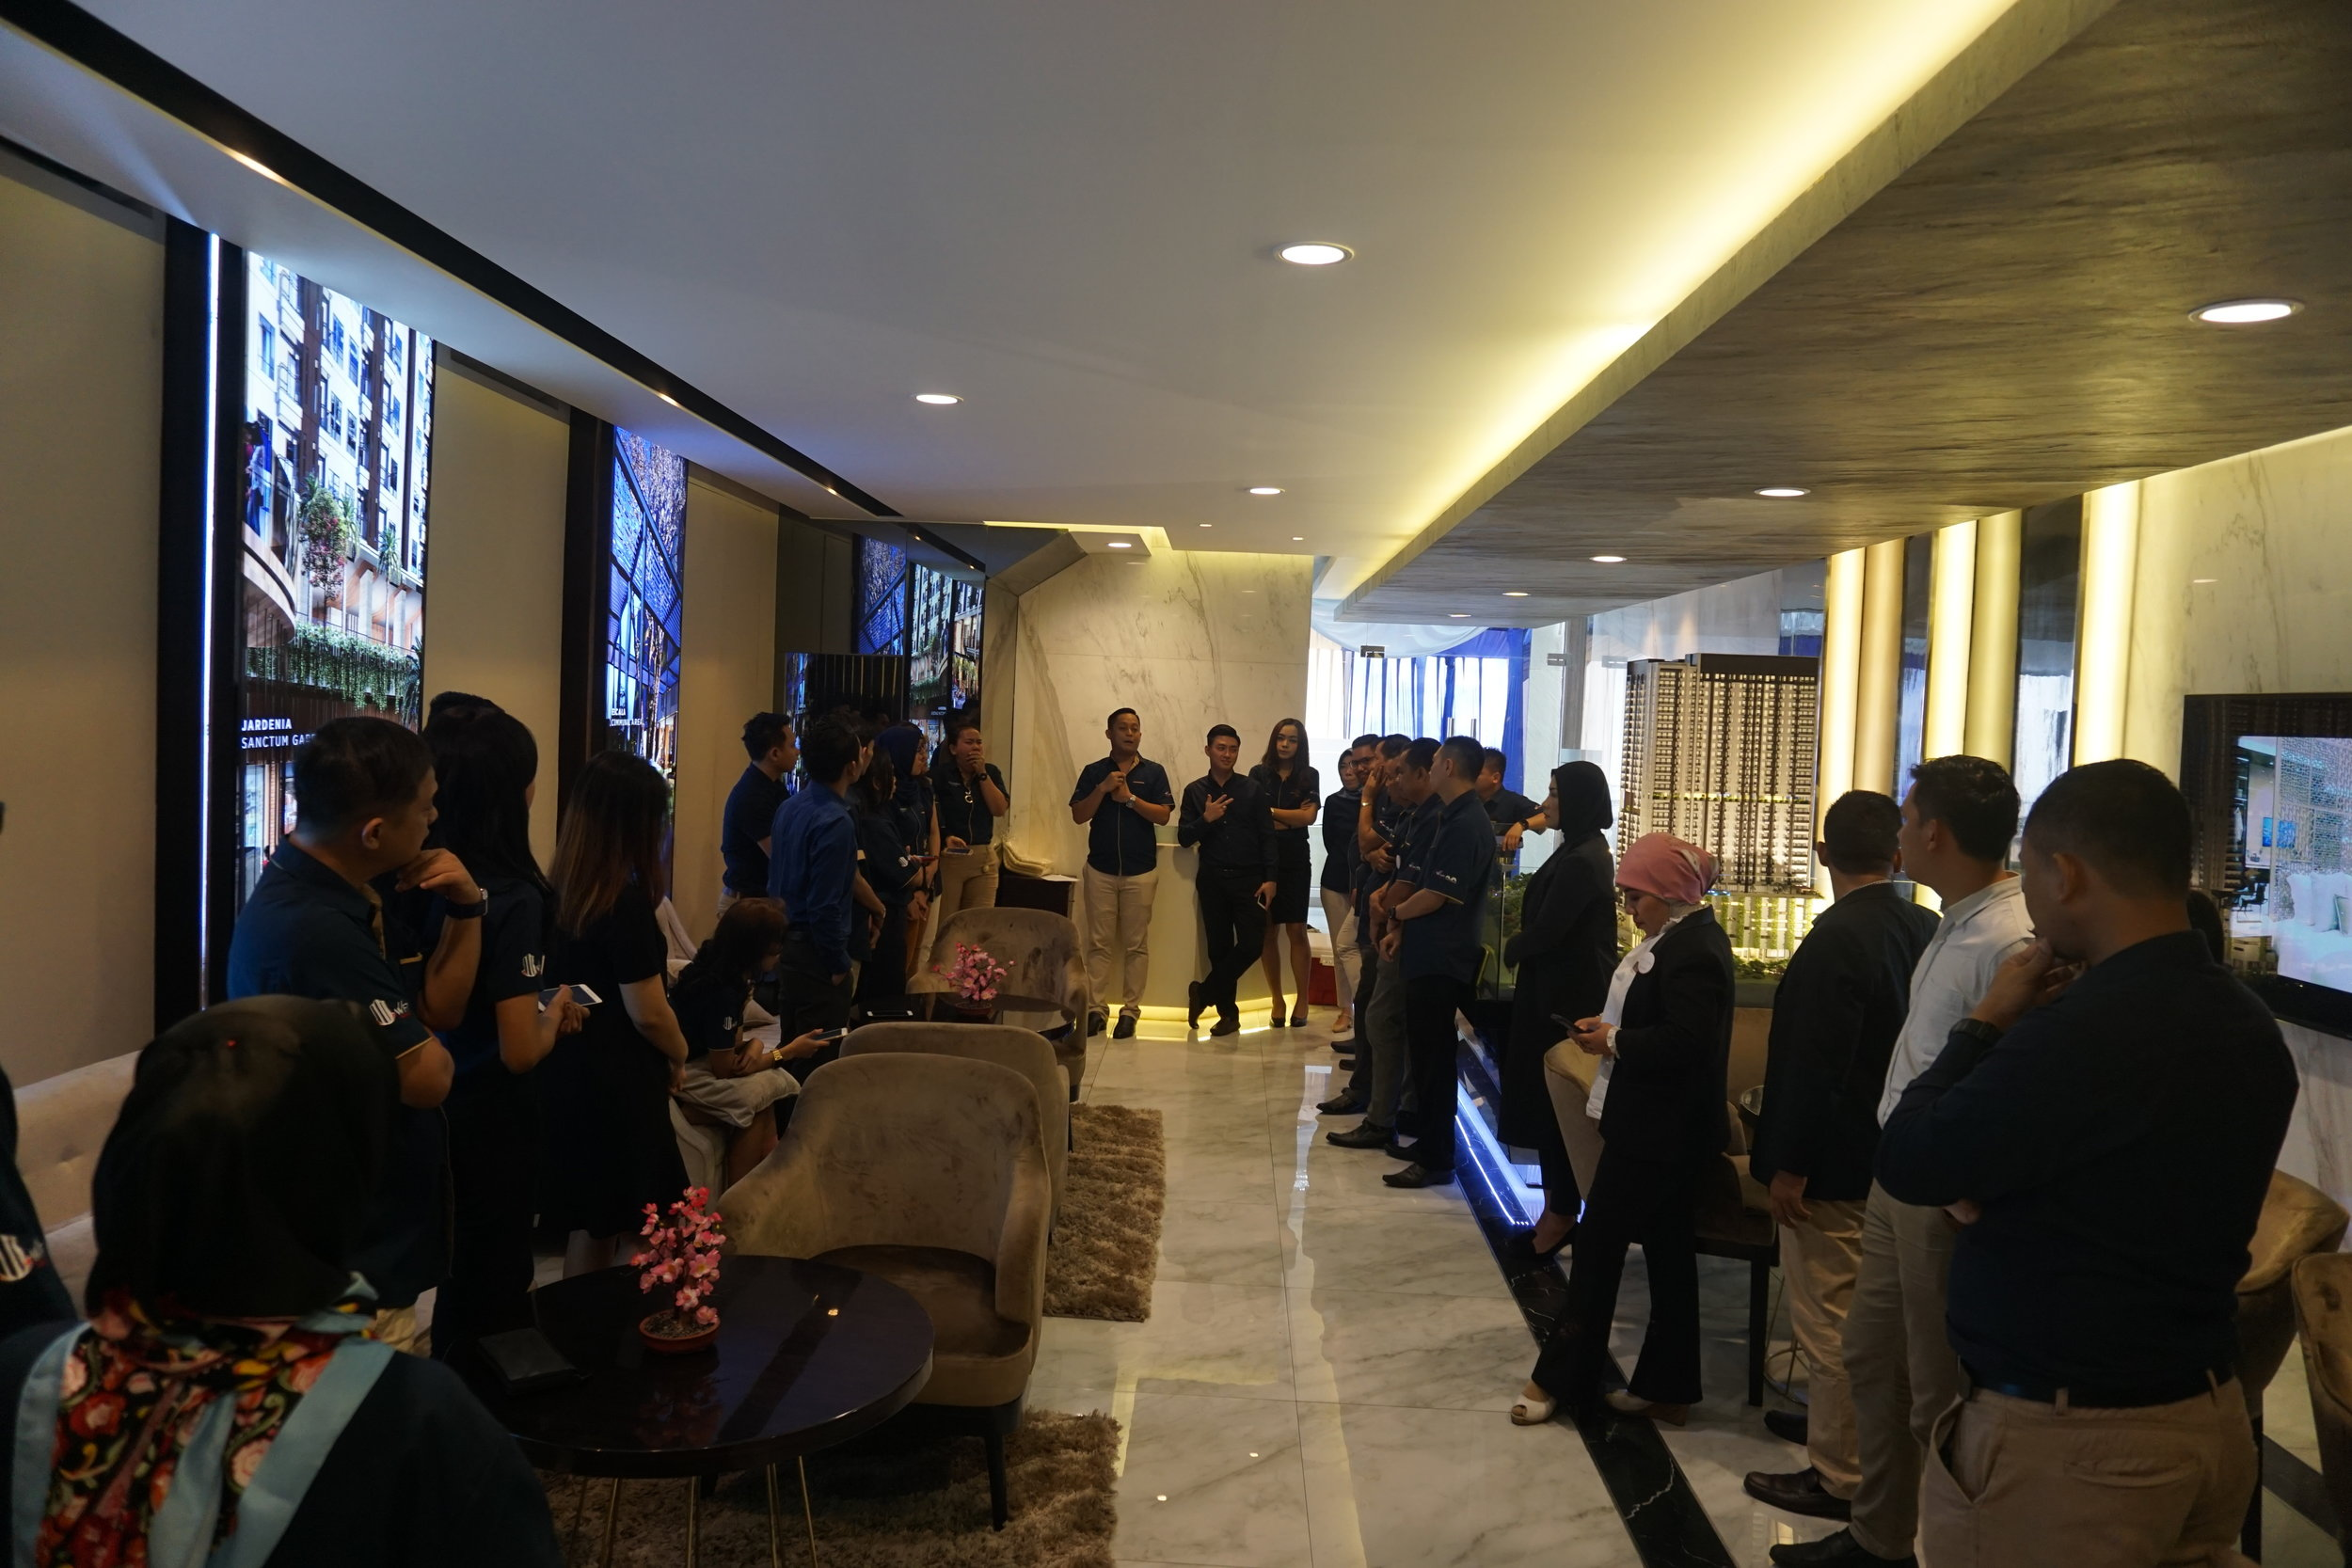 kesiapan tim marketing solterra place untuk menyambut tamu dan memperkenalkan smarthome system